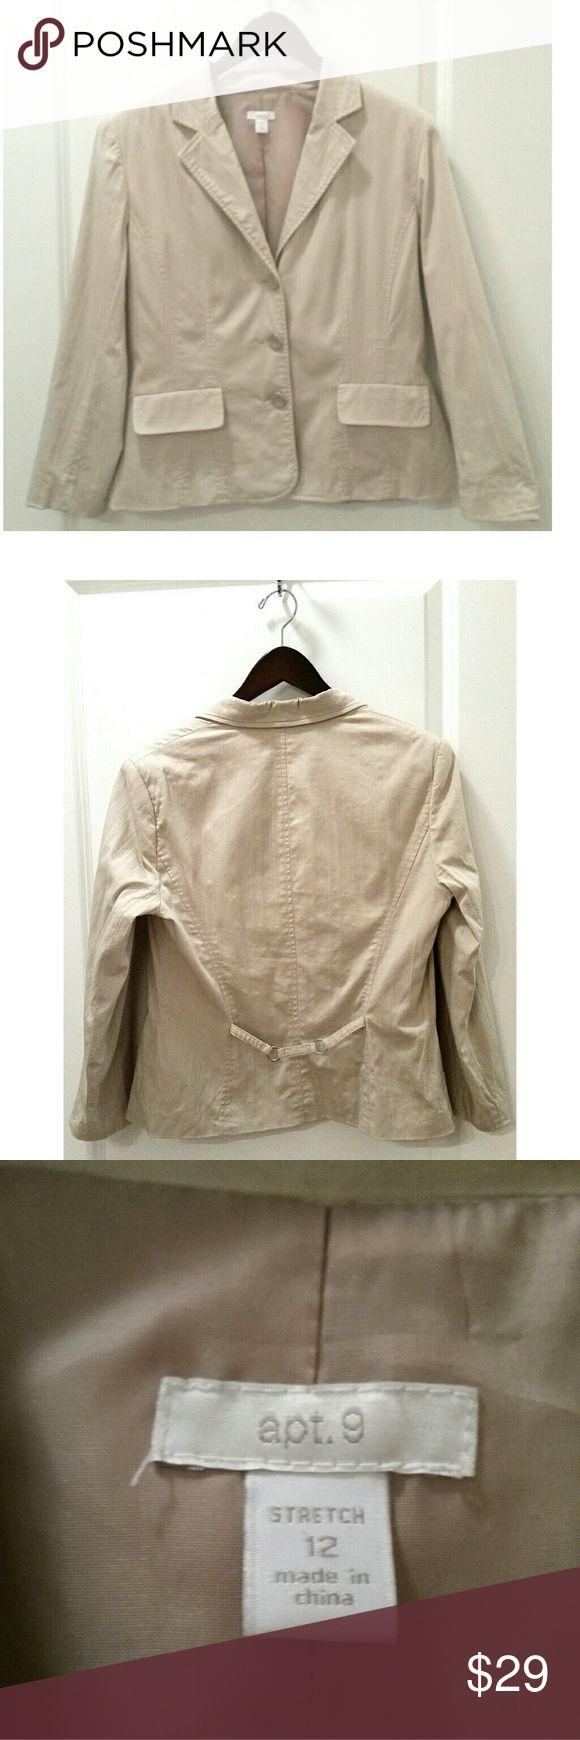 25+ best ideas about Tan blazer on Pinterest | Tan blazer outfits ...